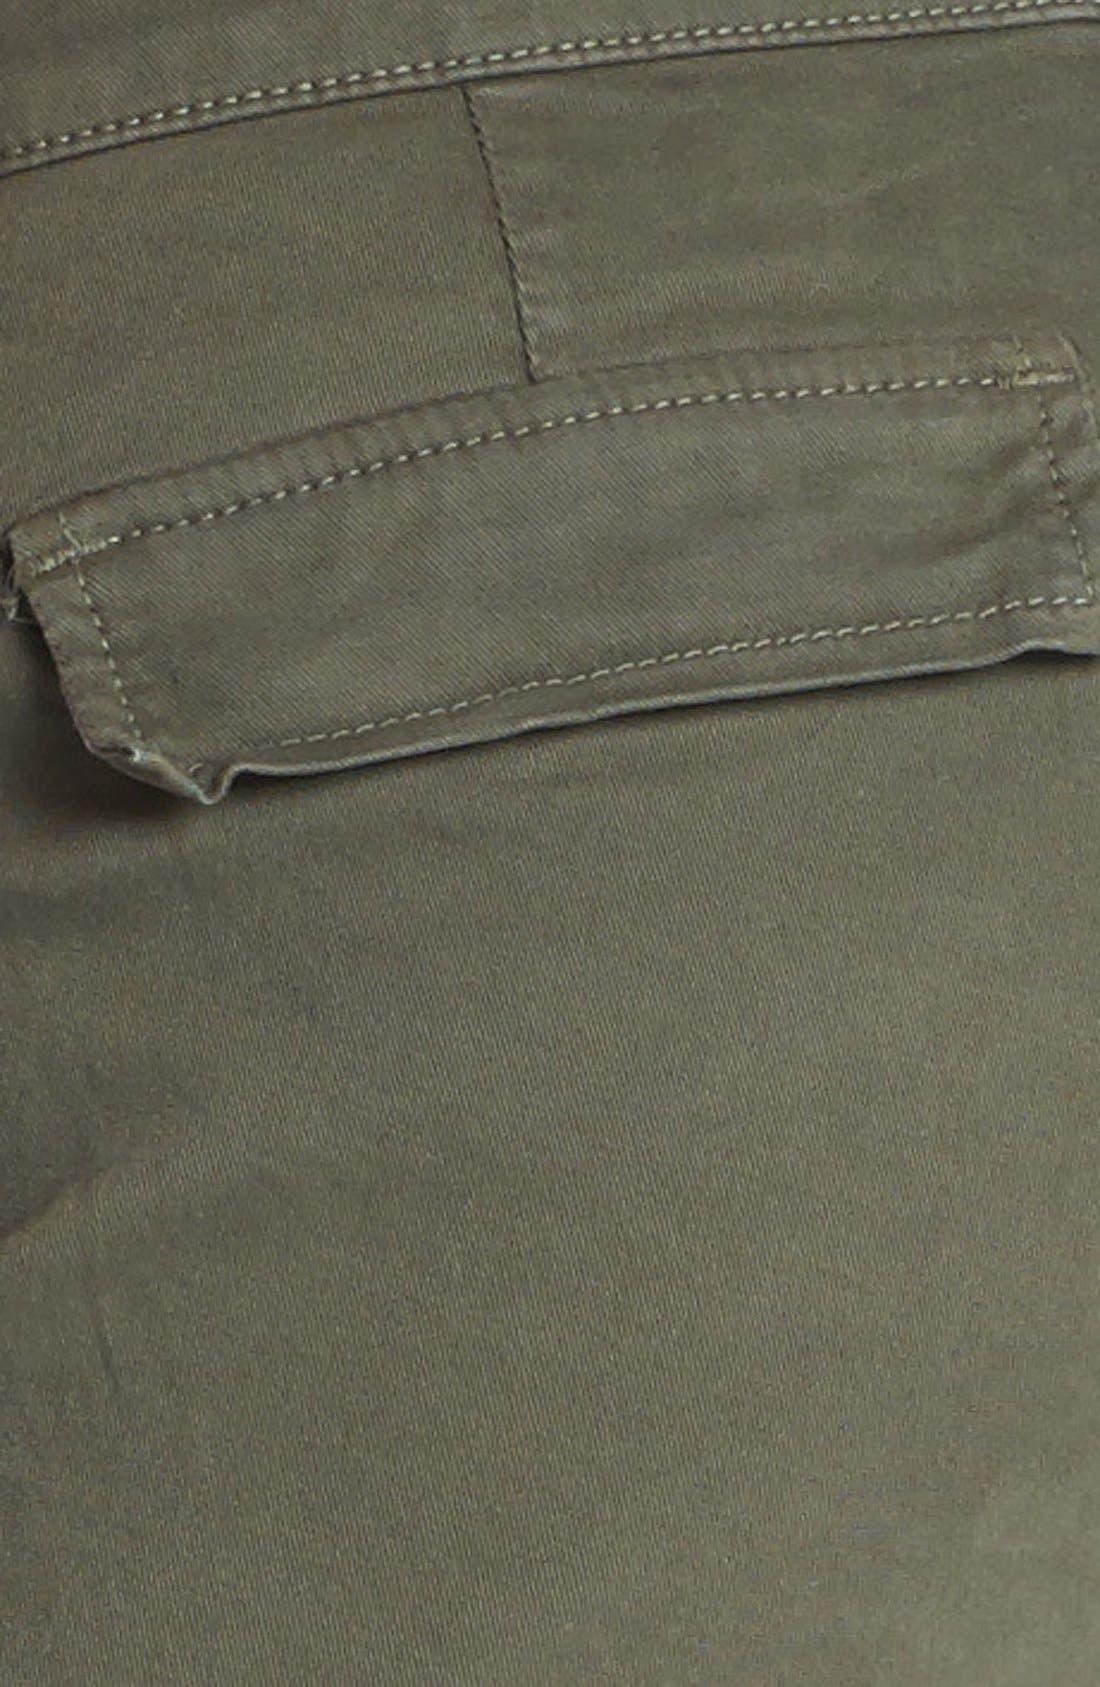 Alternate Image 3  - J Brand Cargo Shorts